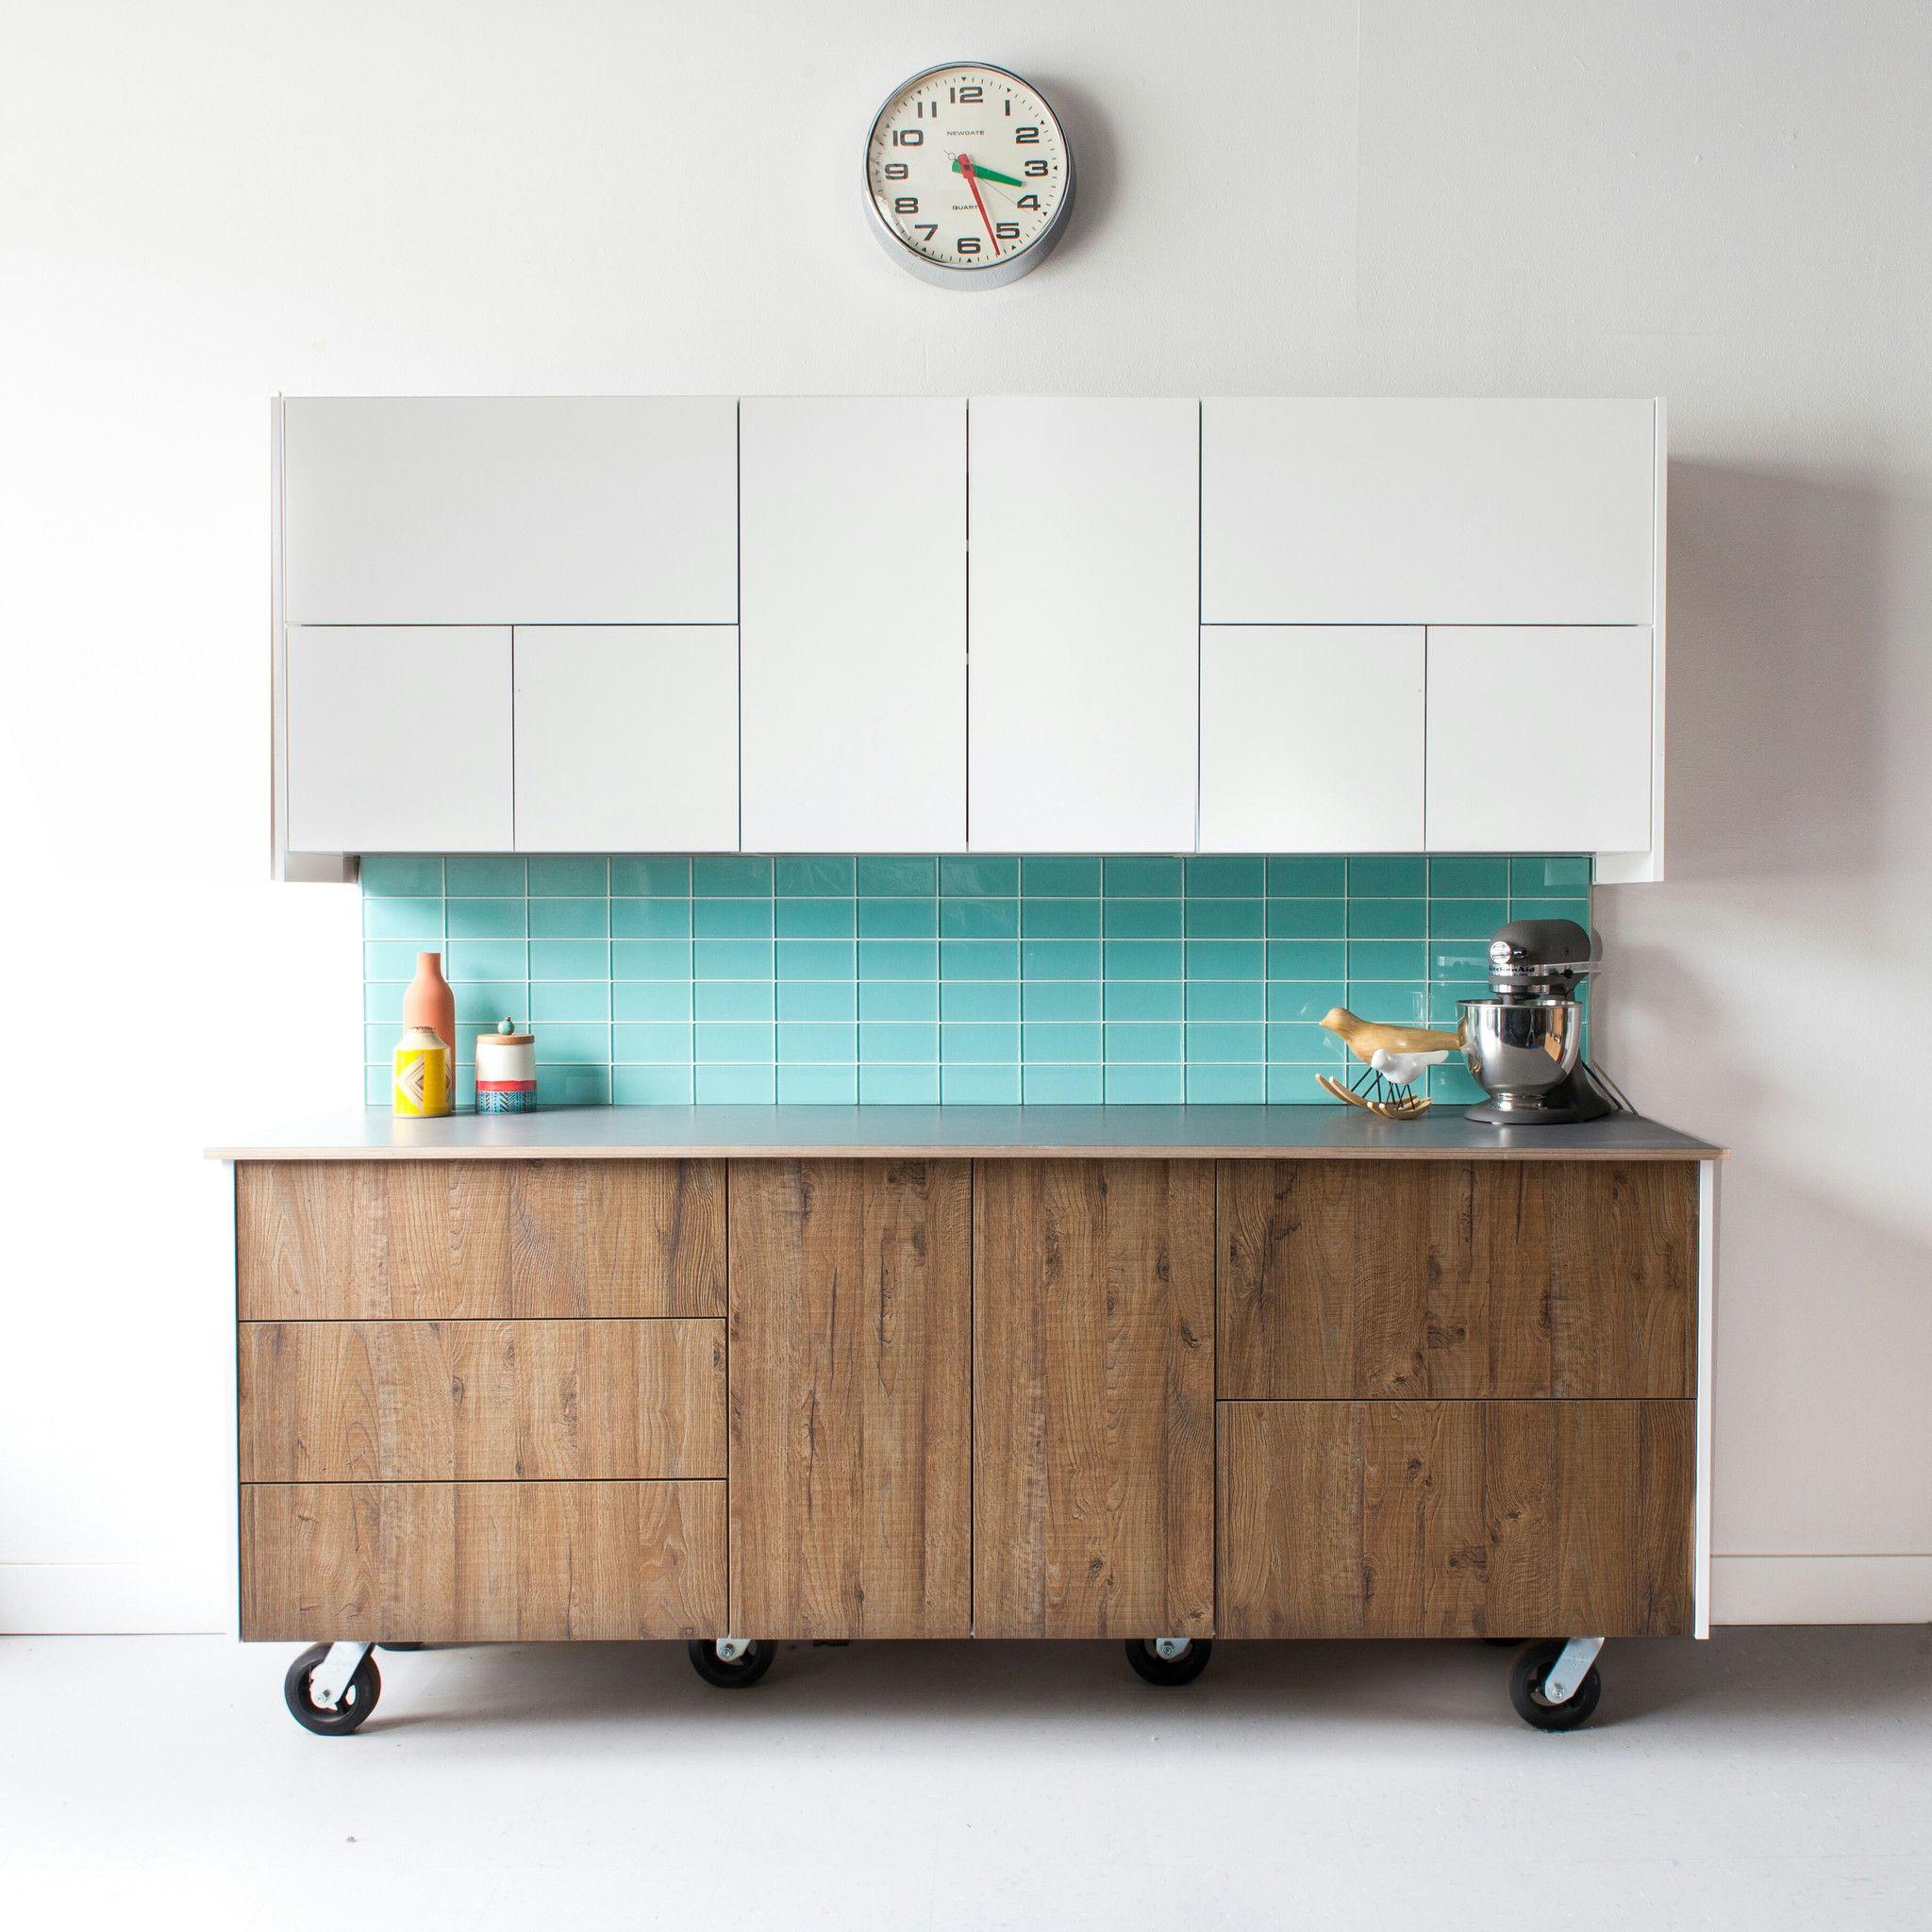 IMPRESSION Semihandmade IKEA with Semihandmade